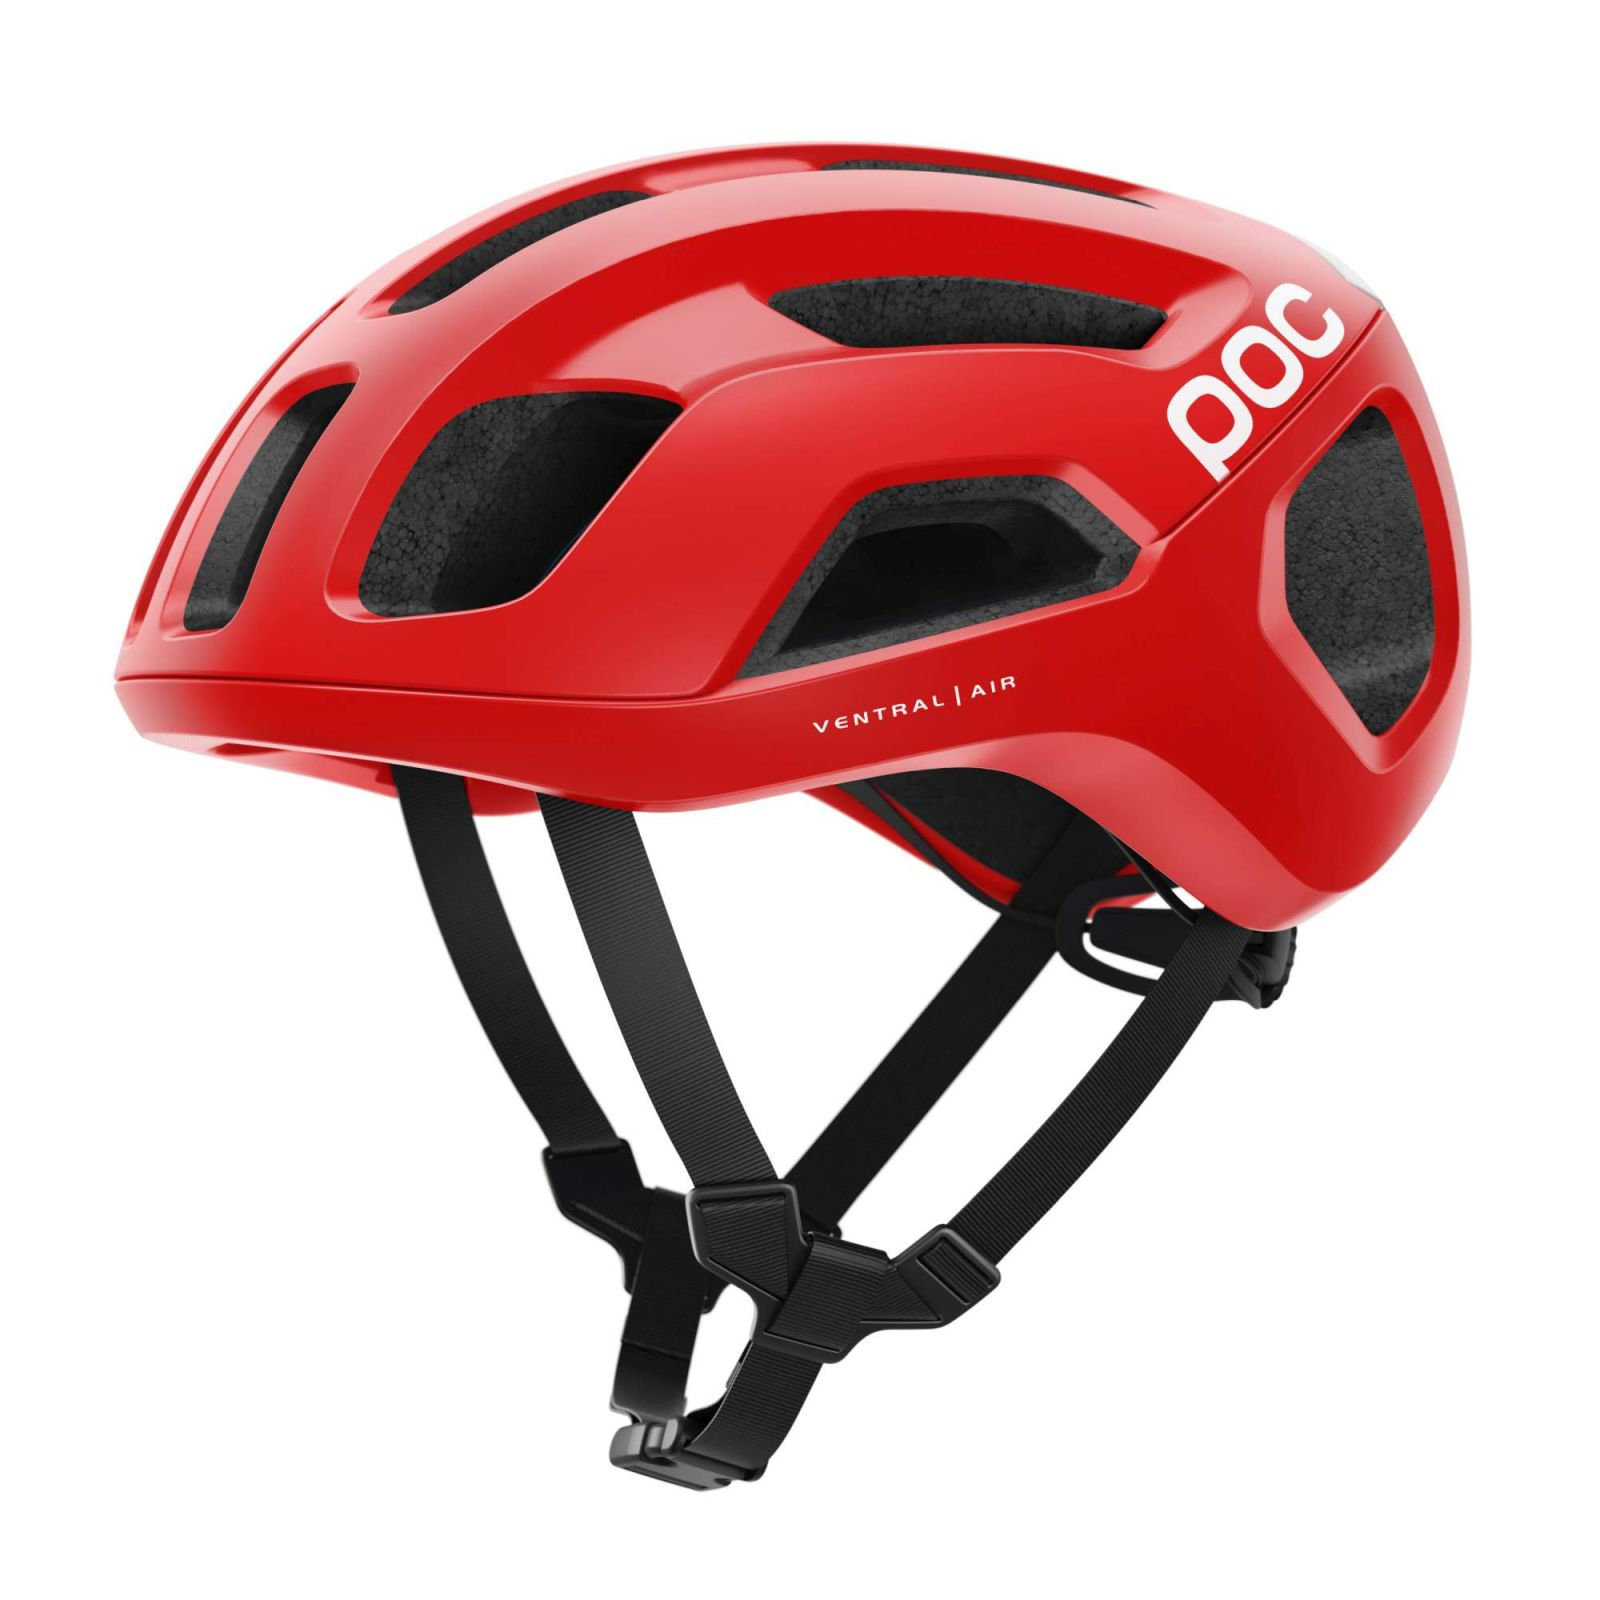 Cyklistická helma POC Ventral Air Spin, Prismane Red Matt